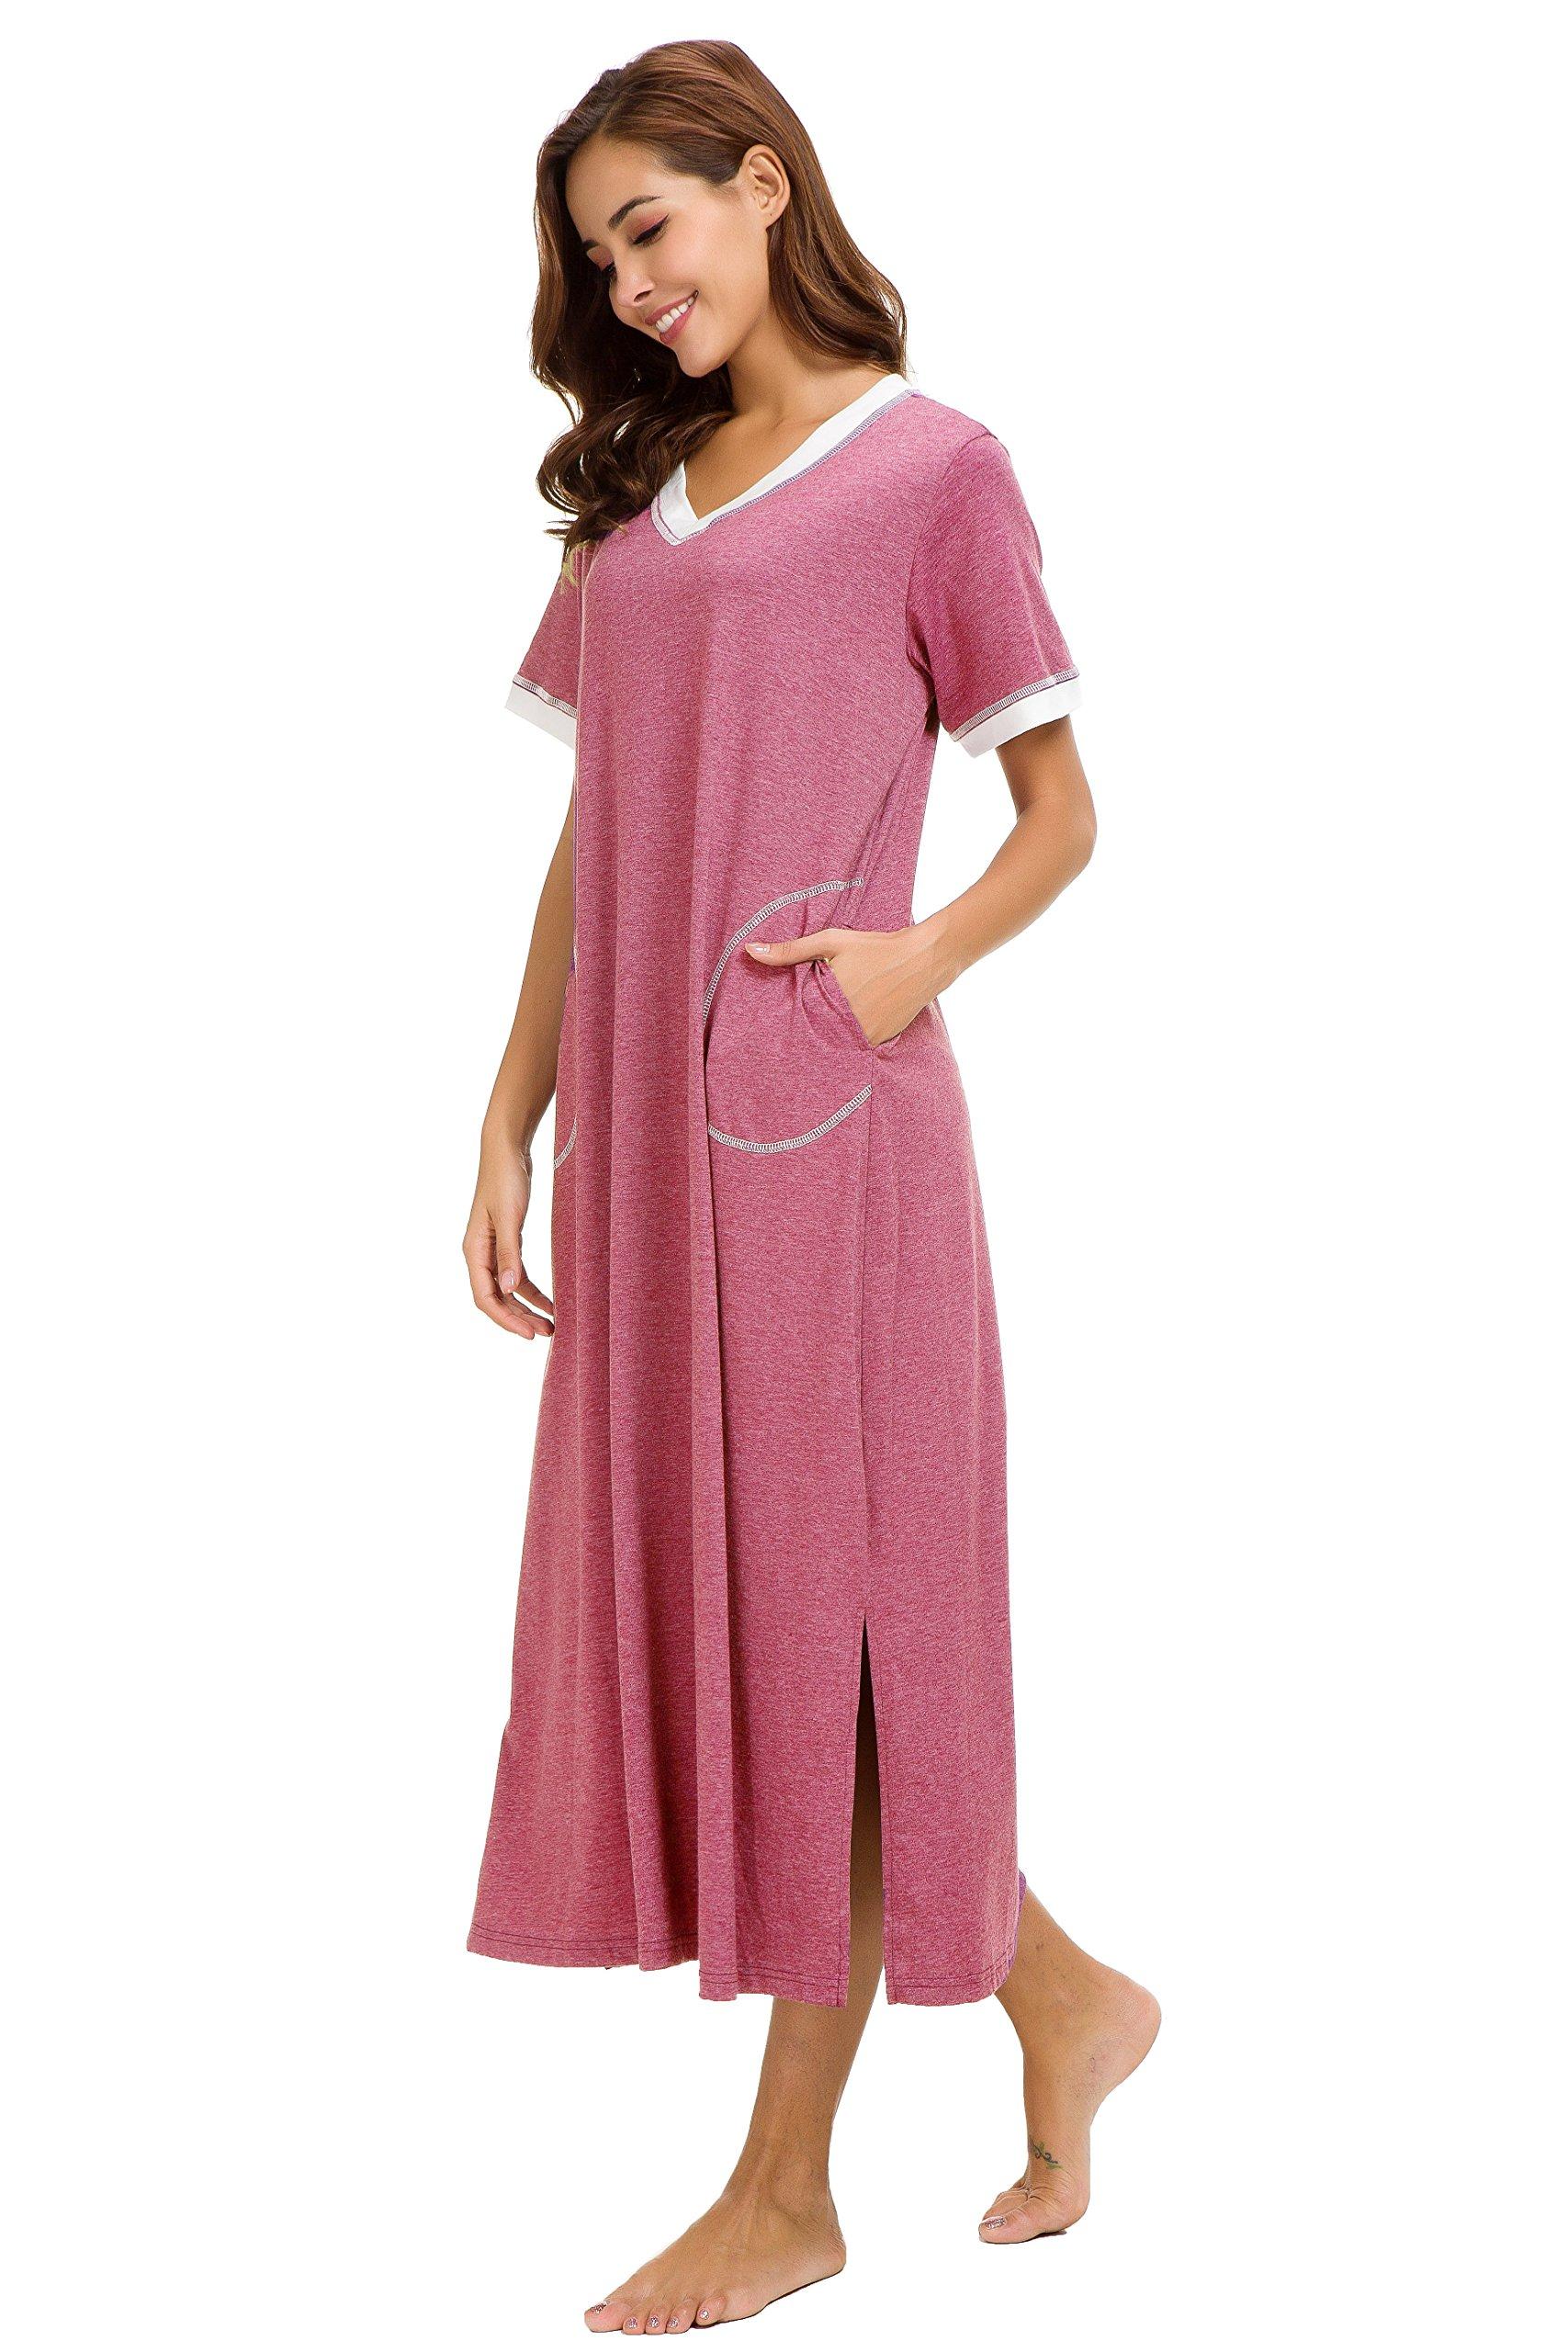 Aviier Supersoft Maxi Sleepshirt with Pockets, Nightgowns for Women Short Sleeve Cotton Nightshirts Sleepwear (XXL, Red) by Aviier (Image #4)